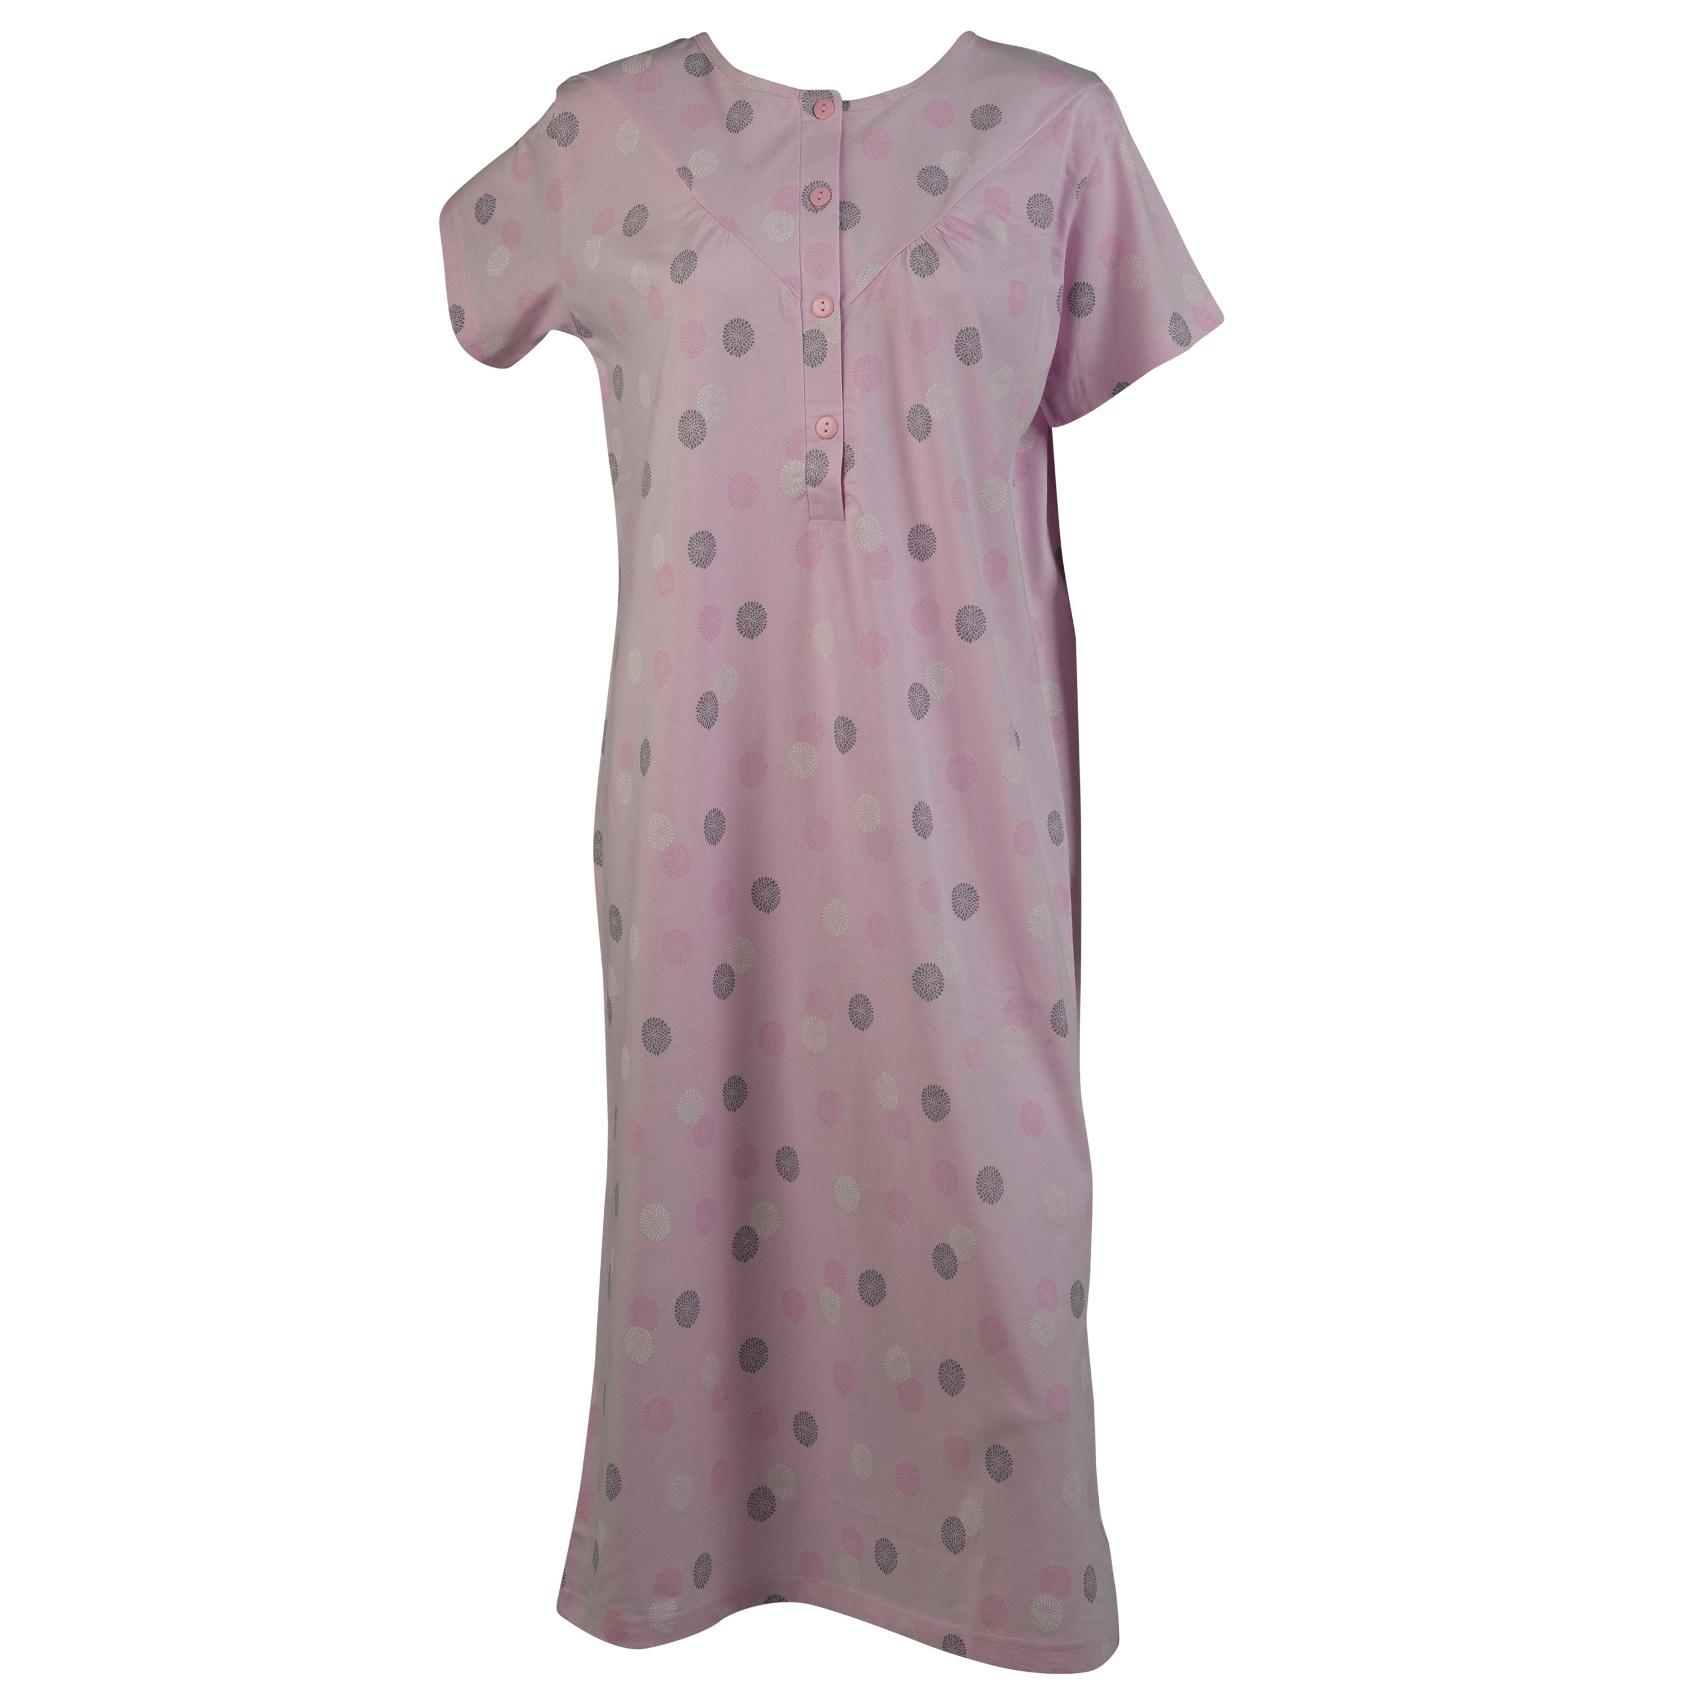 Womens Flower Nightdress Ladies Cotton Short Sleeve Nighty Nightwear Blue  Pink 842cdb71d